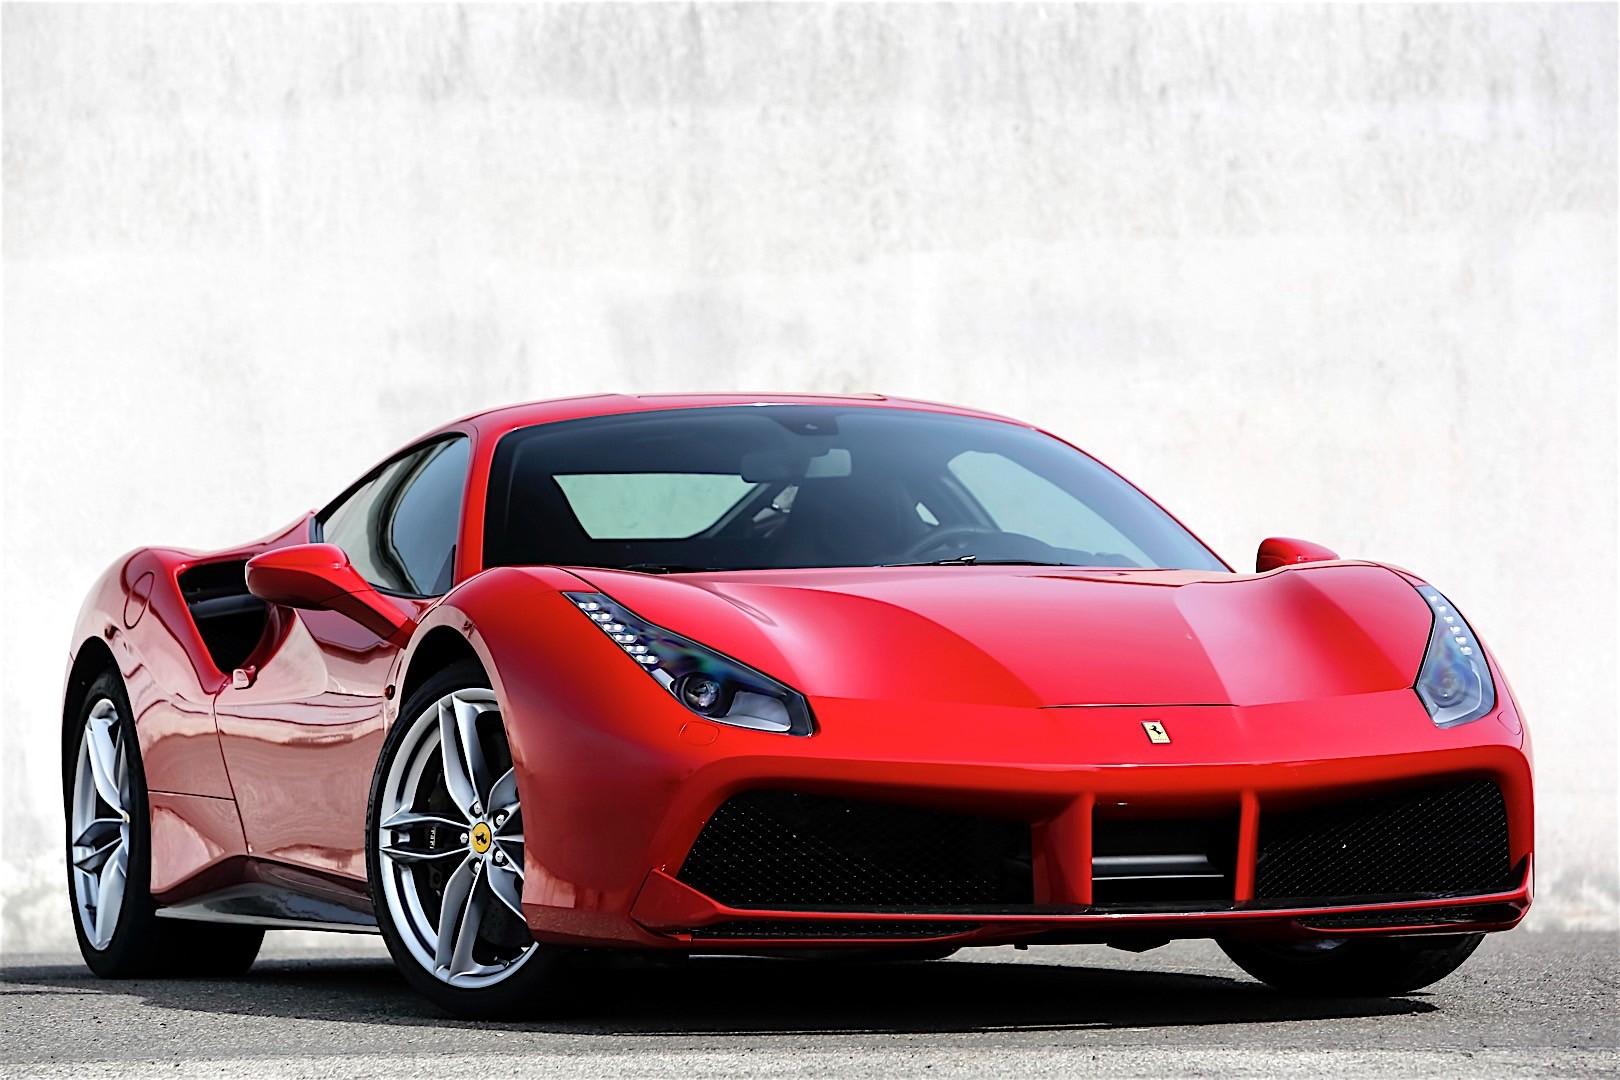 2015 Ferrari 458 Speciale >> FERRARI 488 GTB specs & photos - 2015, 2016, 2017, 2018, 2019, 2020 - autoevolution